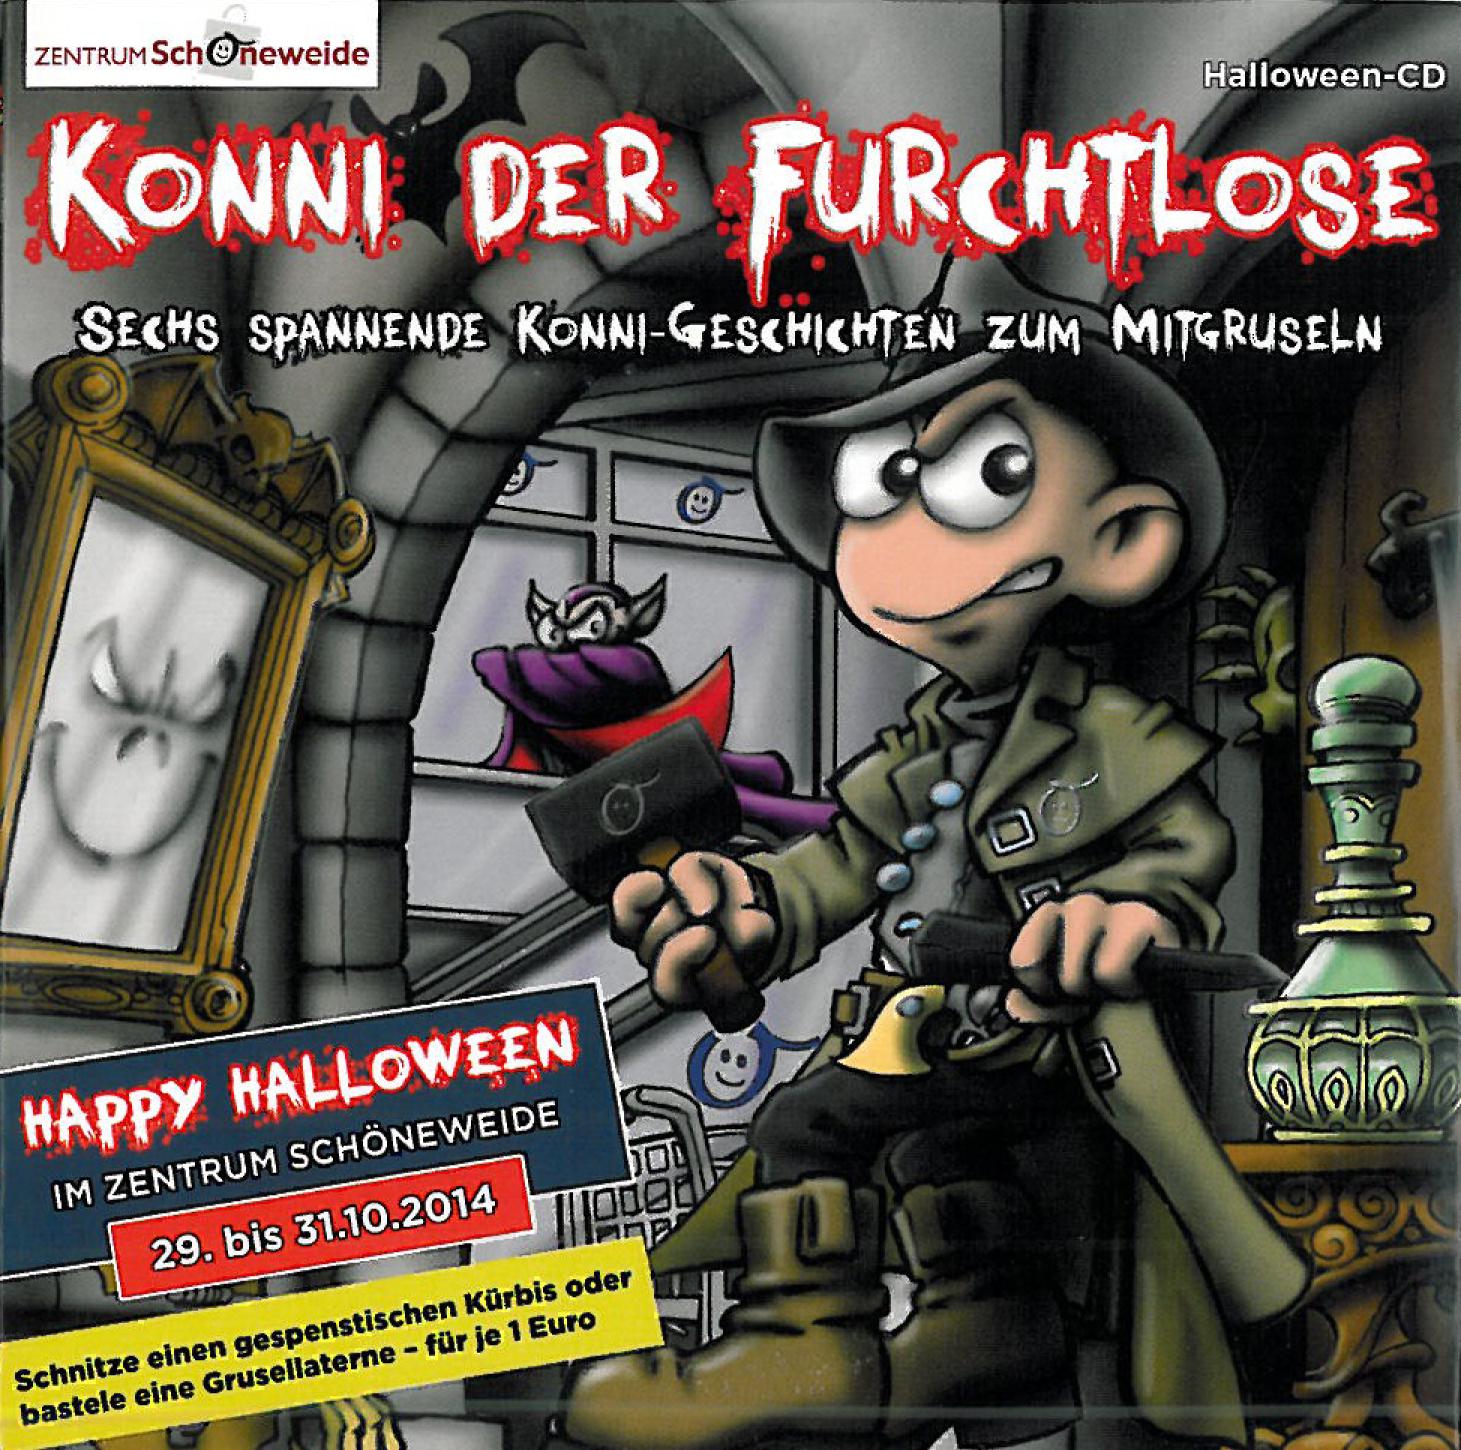 Helloween_CD_Cover-konni